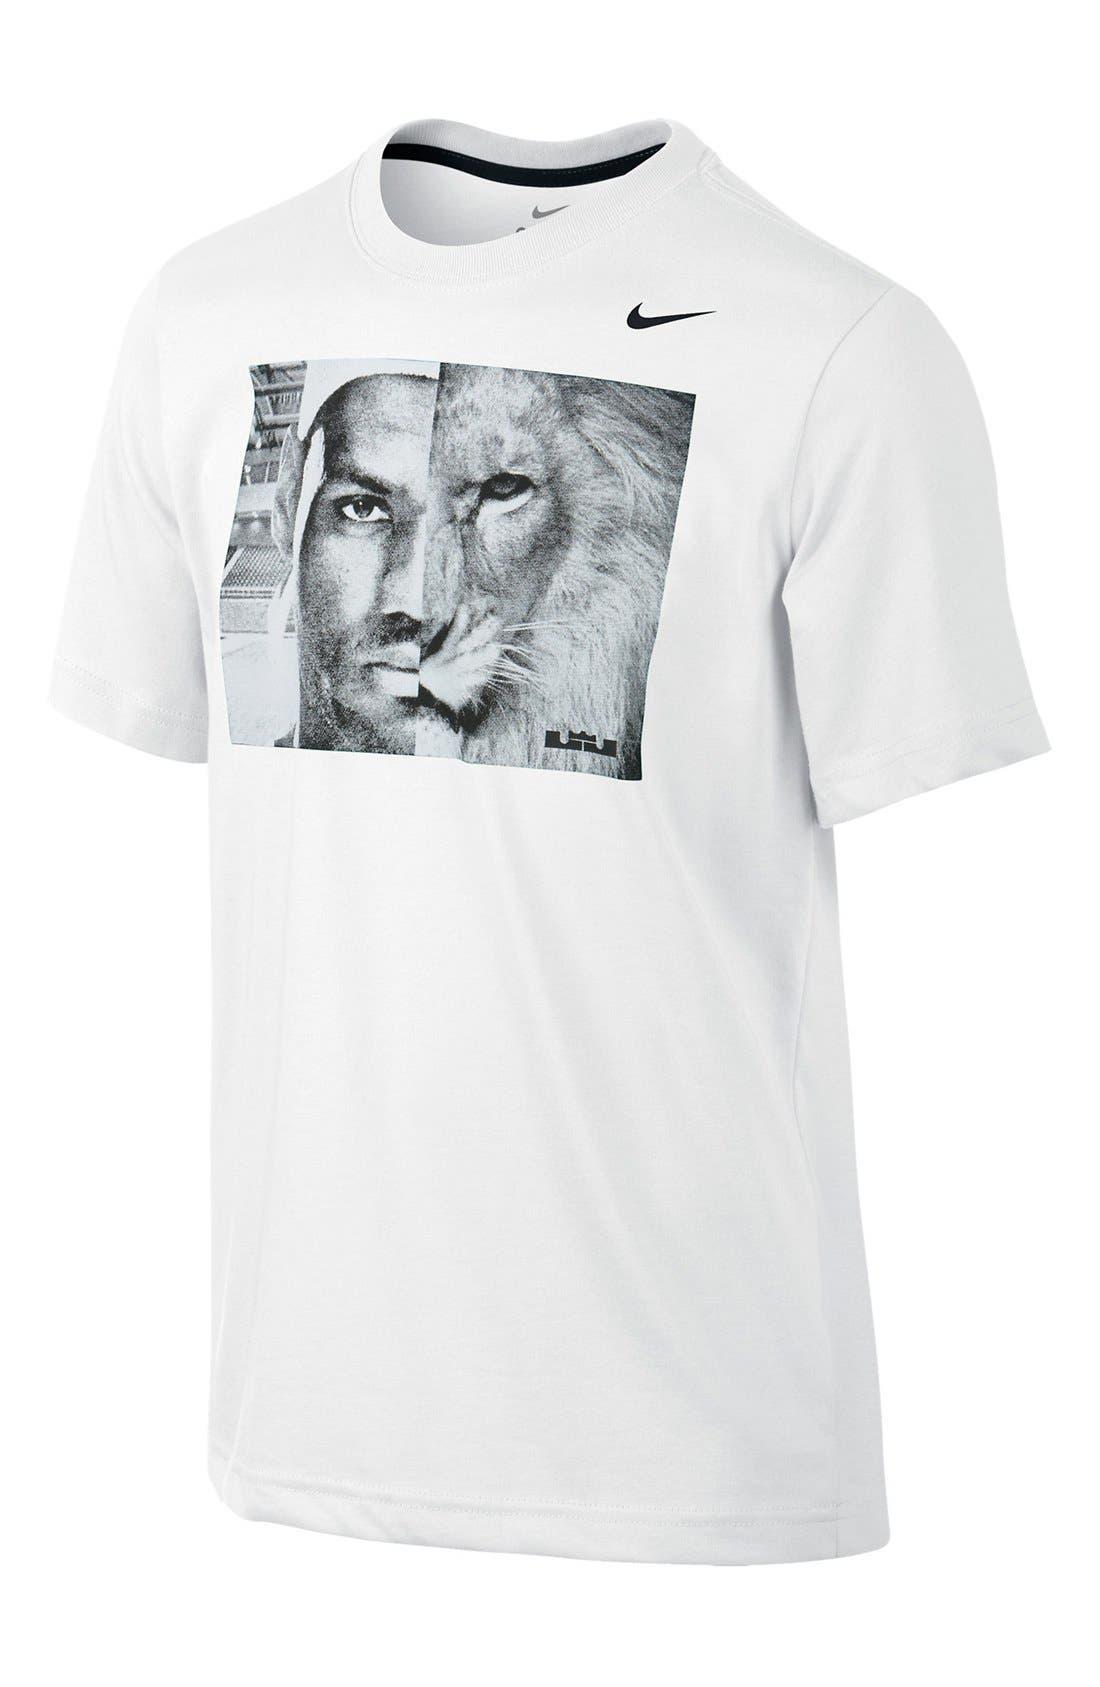 Alternate Image 1 Selected - Nike 'Opposing Forces' T-Shirt (Big Boys)